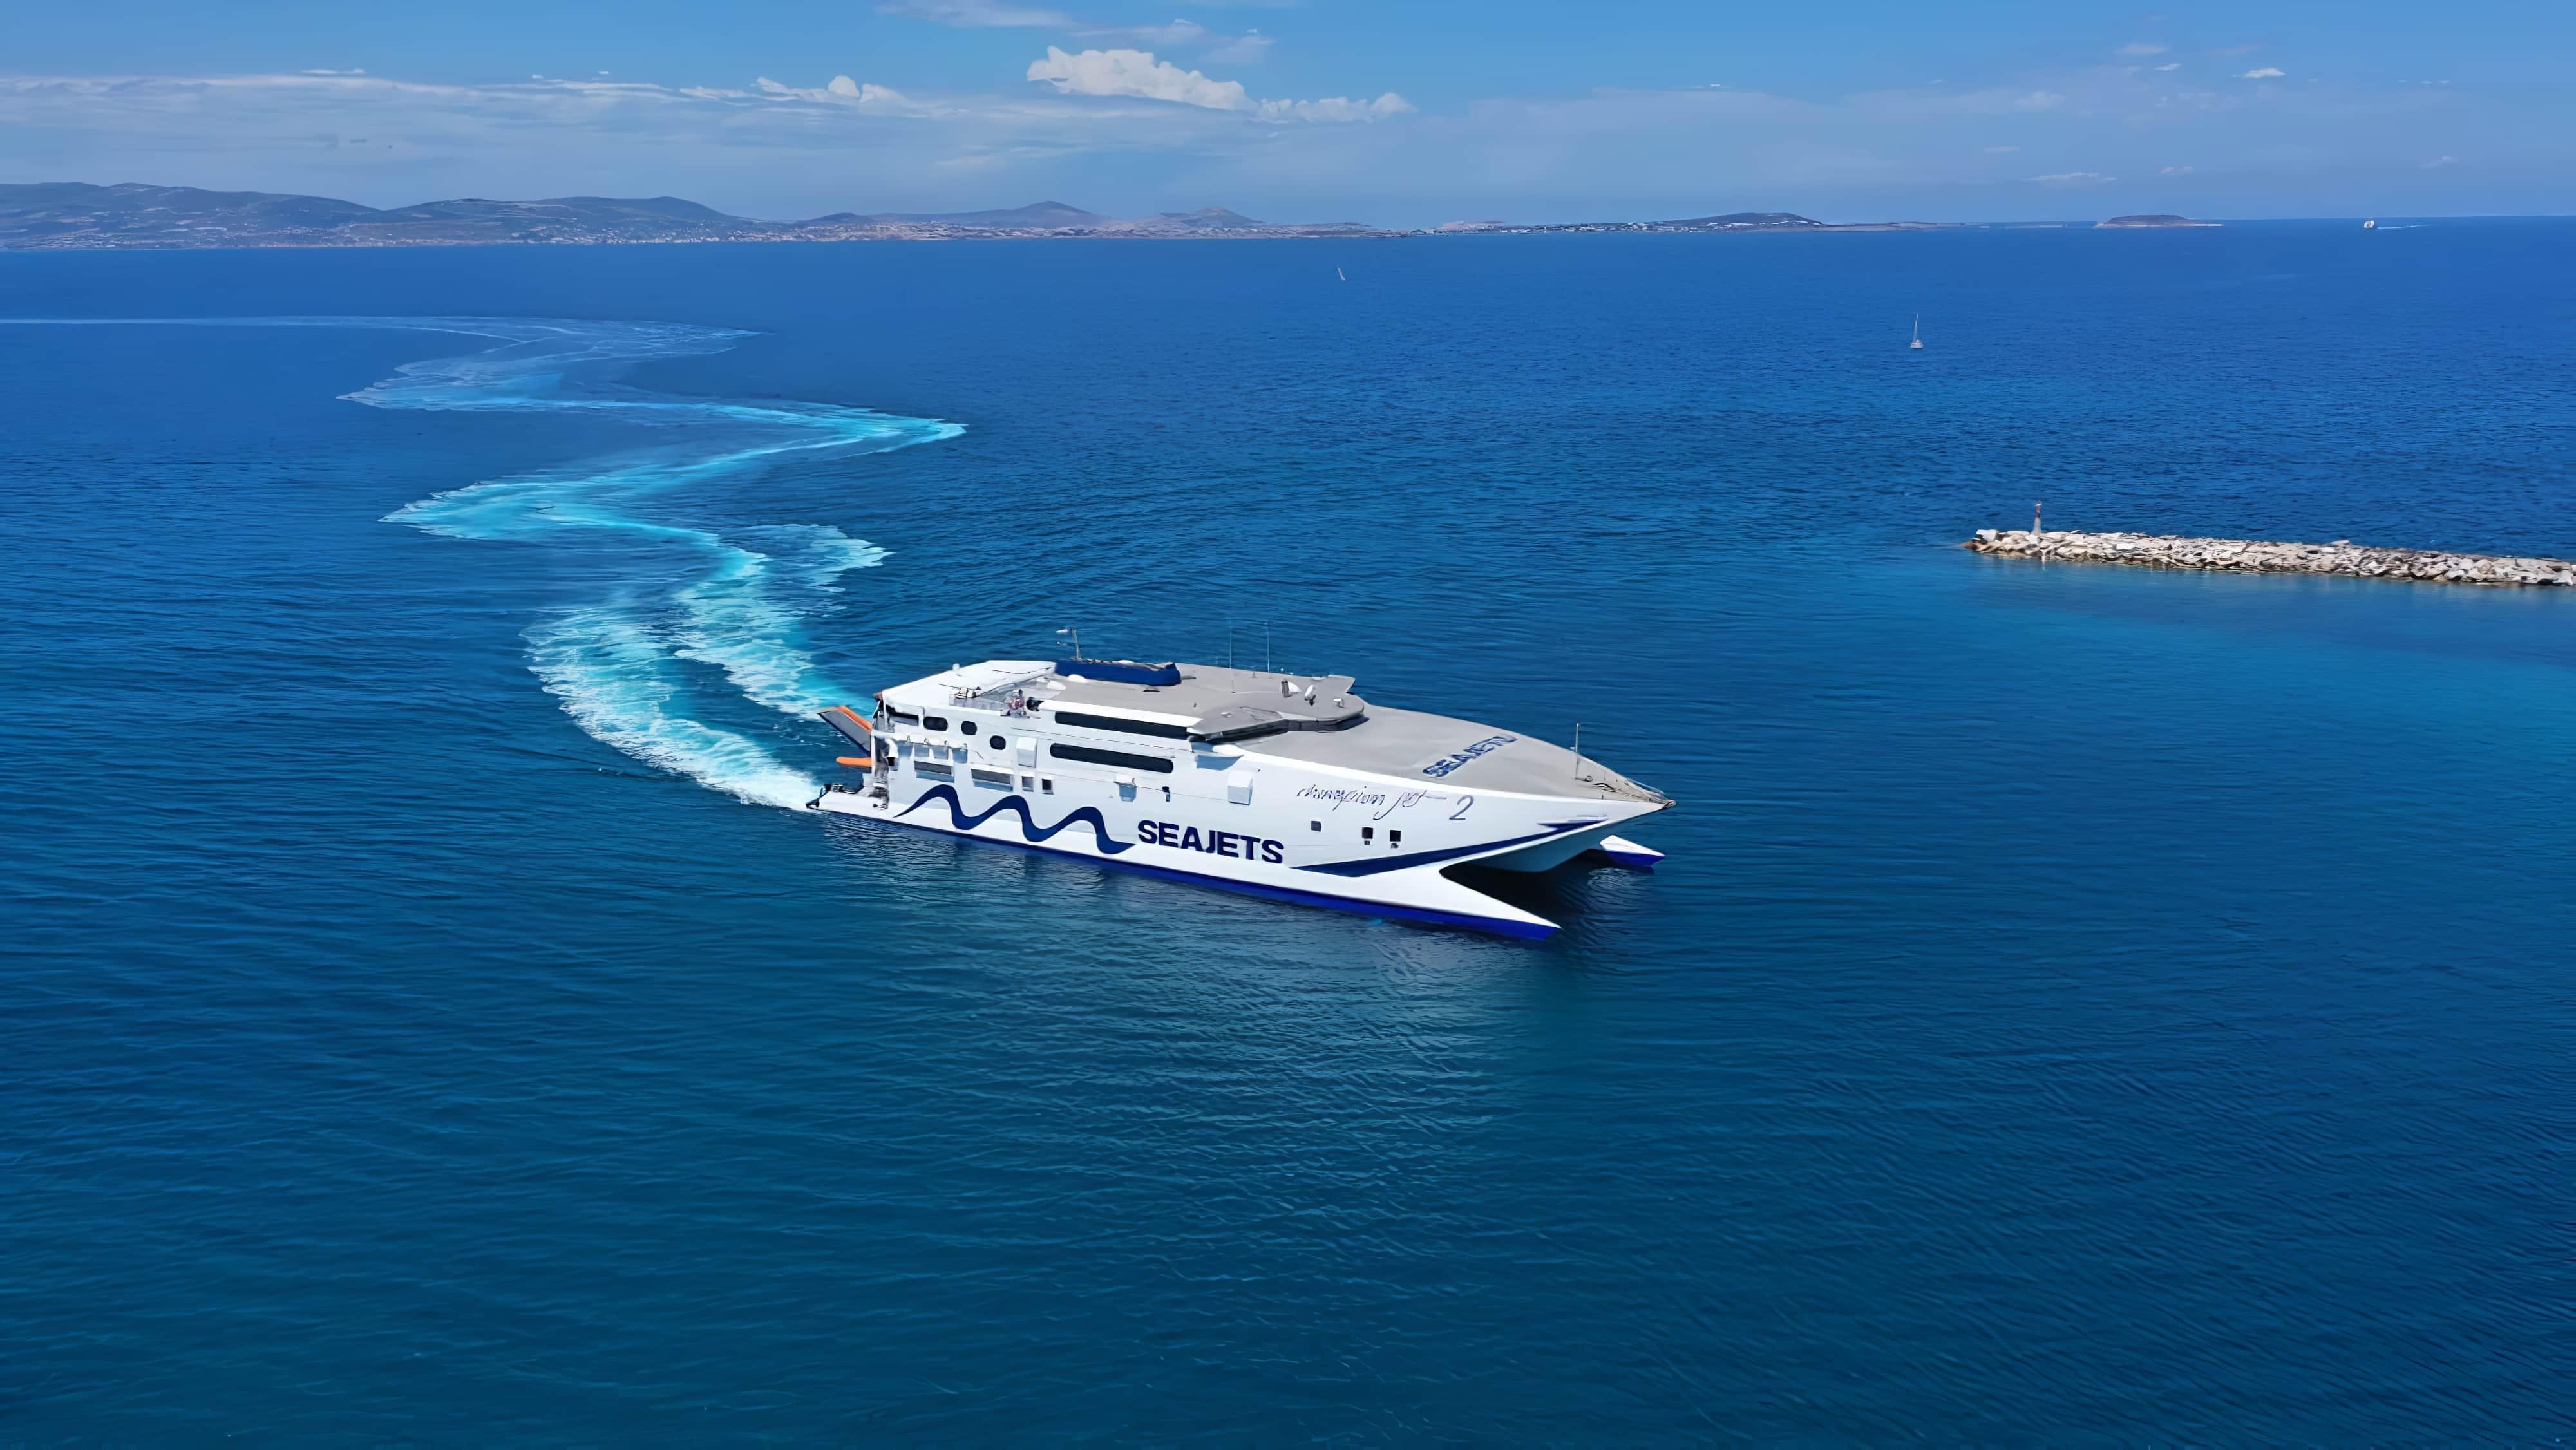 Ferry SeatJet dans la Mer Egée en Grèce